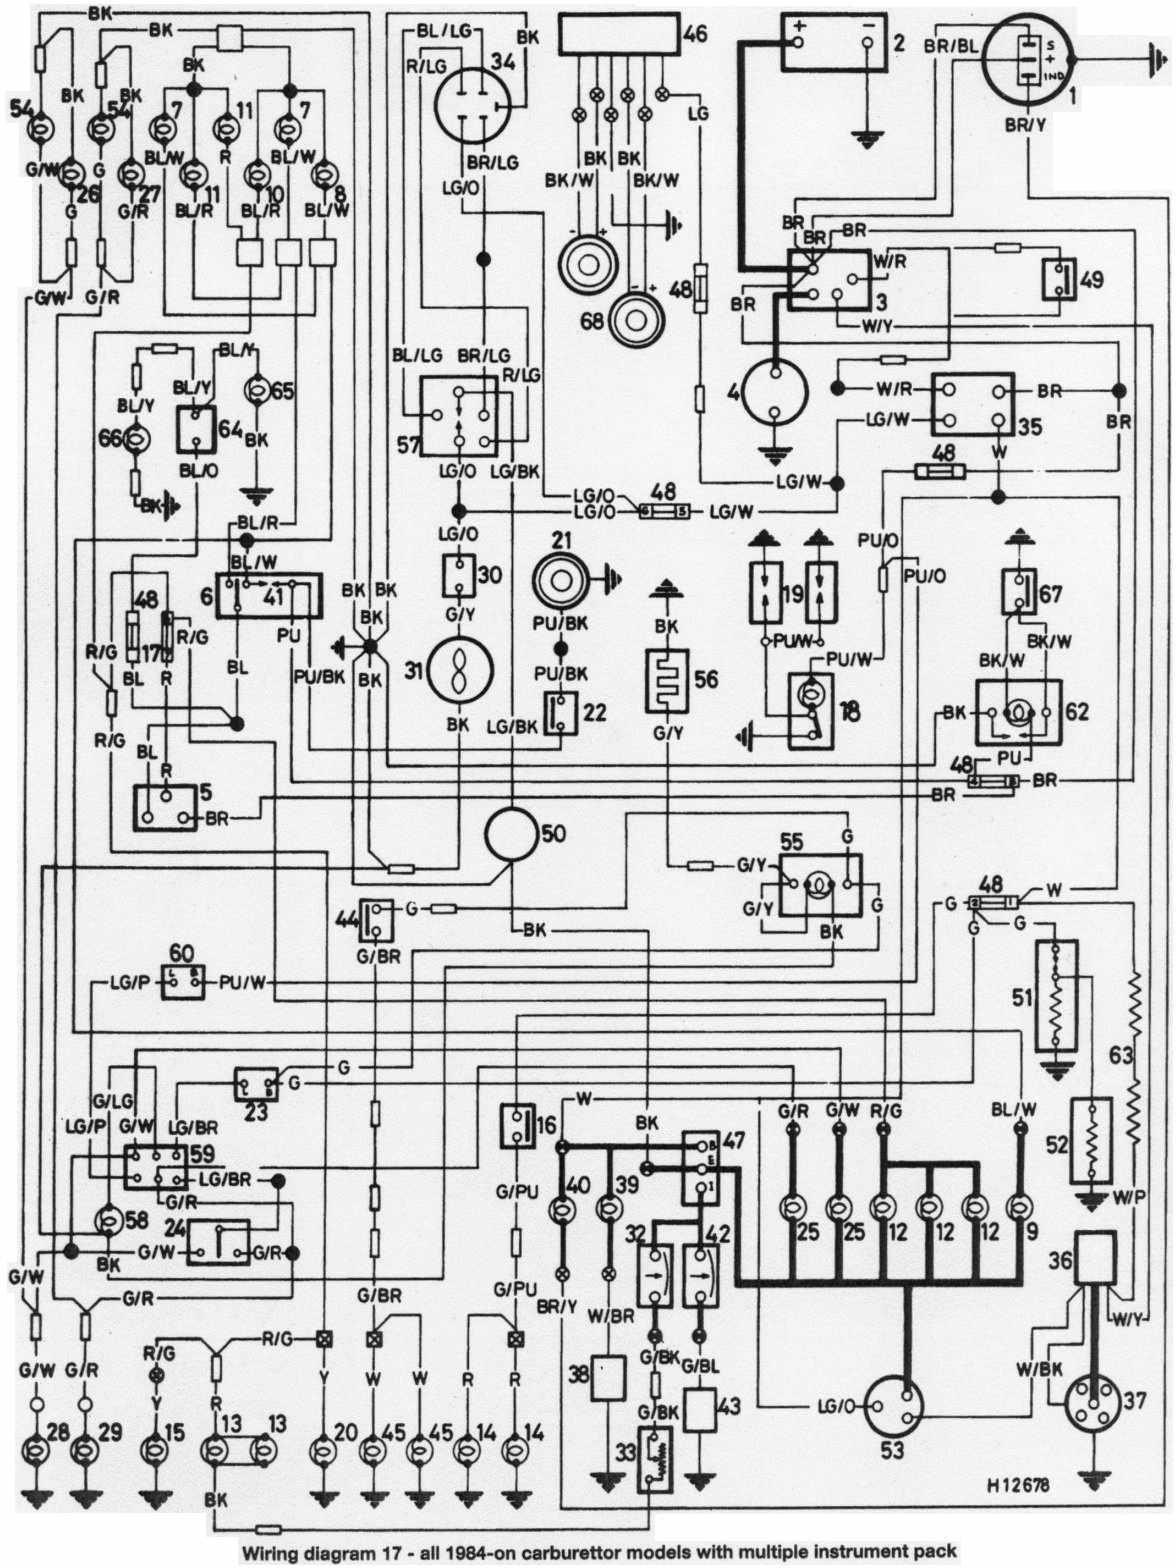 Bmw R65 Wiring Loom Electrical Diagram 1999 Winnebago Adventurer 40 1979 1980